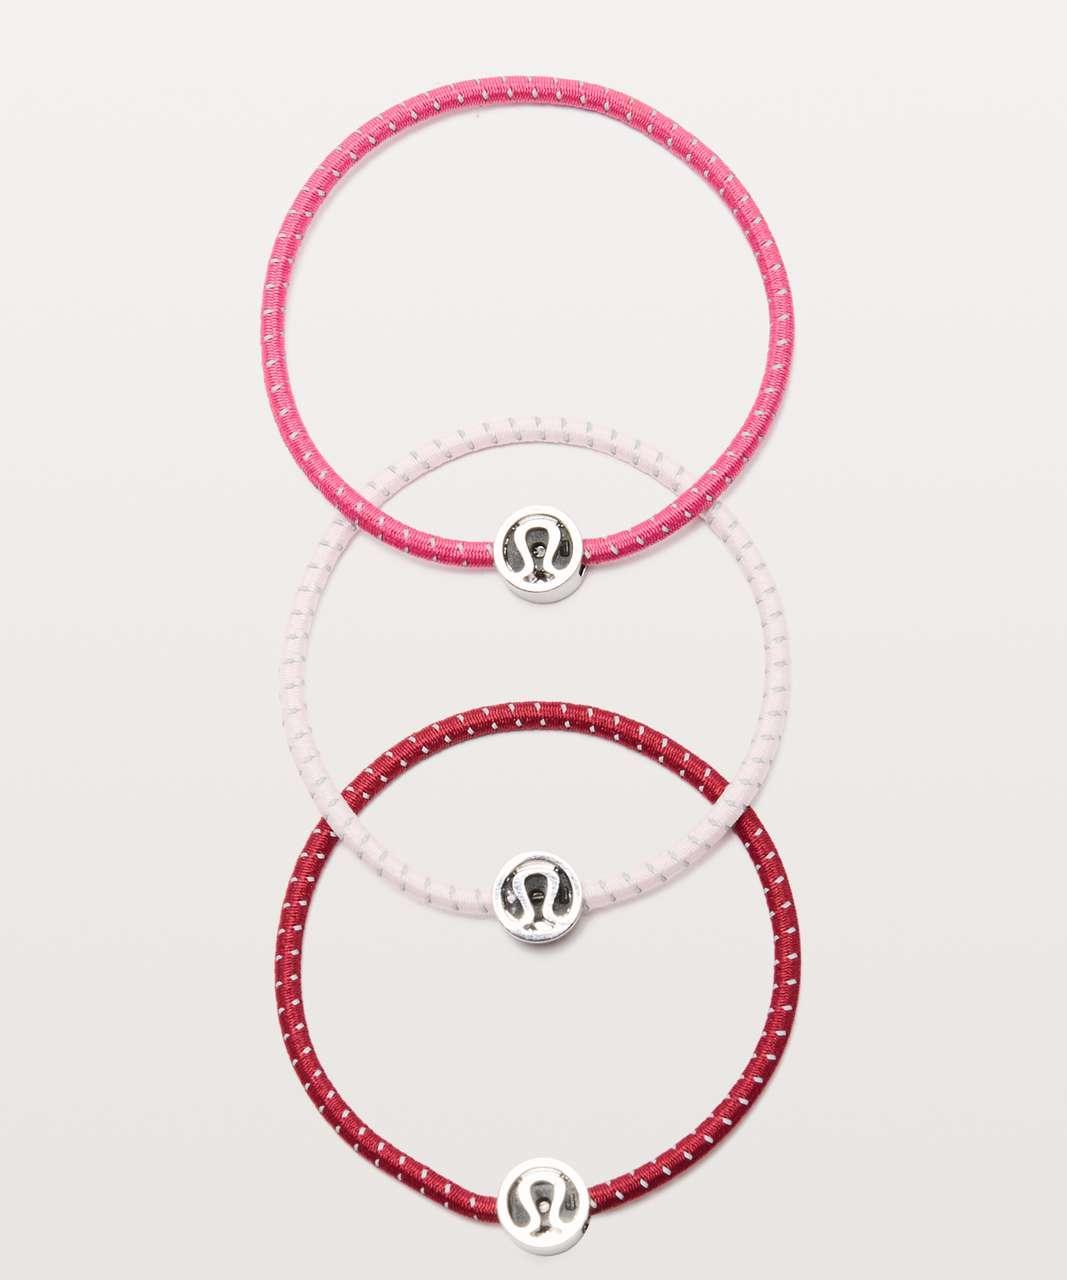 Lululemon Glow On Hair Ties - Violet Red / Blissful Pink / Sonic Pink